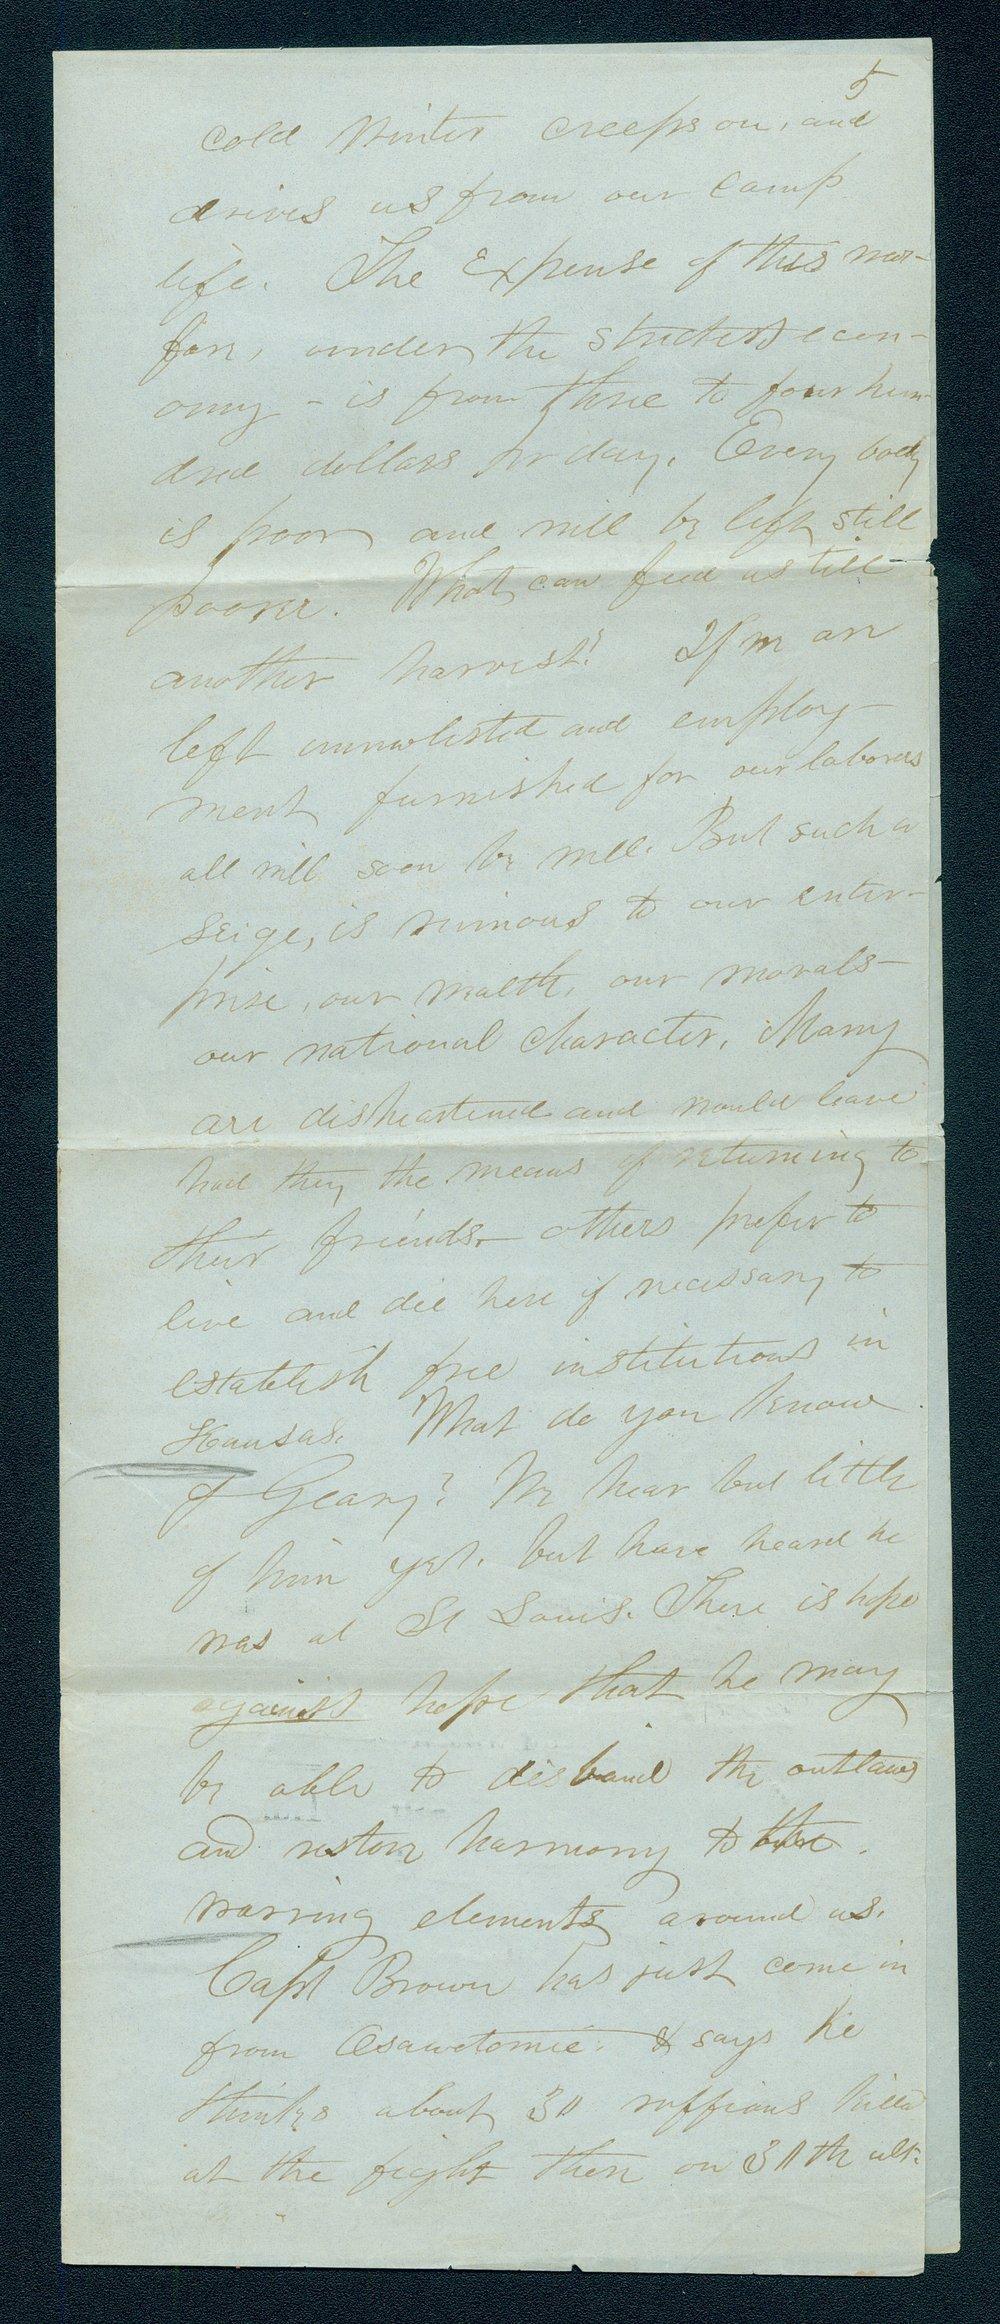 William Hutchinson to Andrew Horatio Reeder - 5